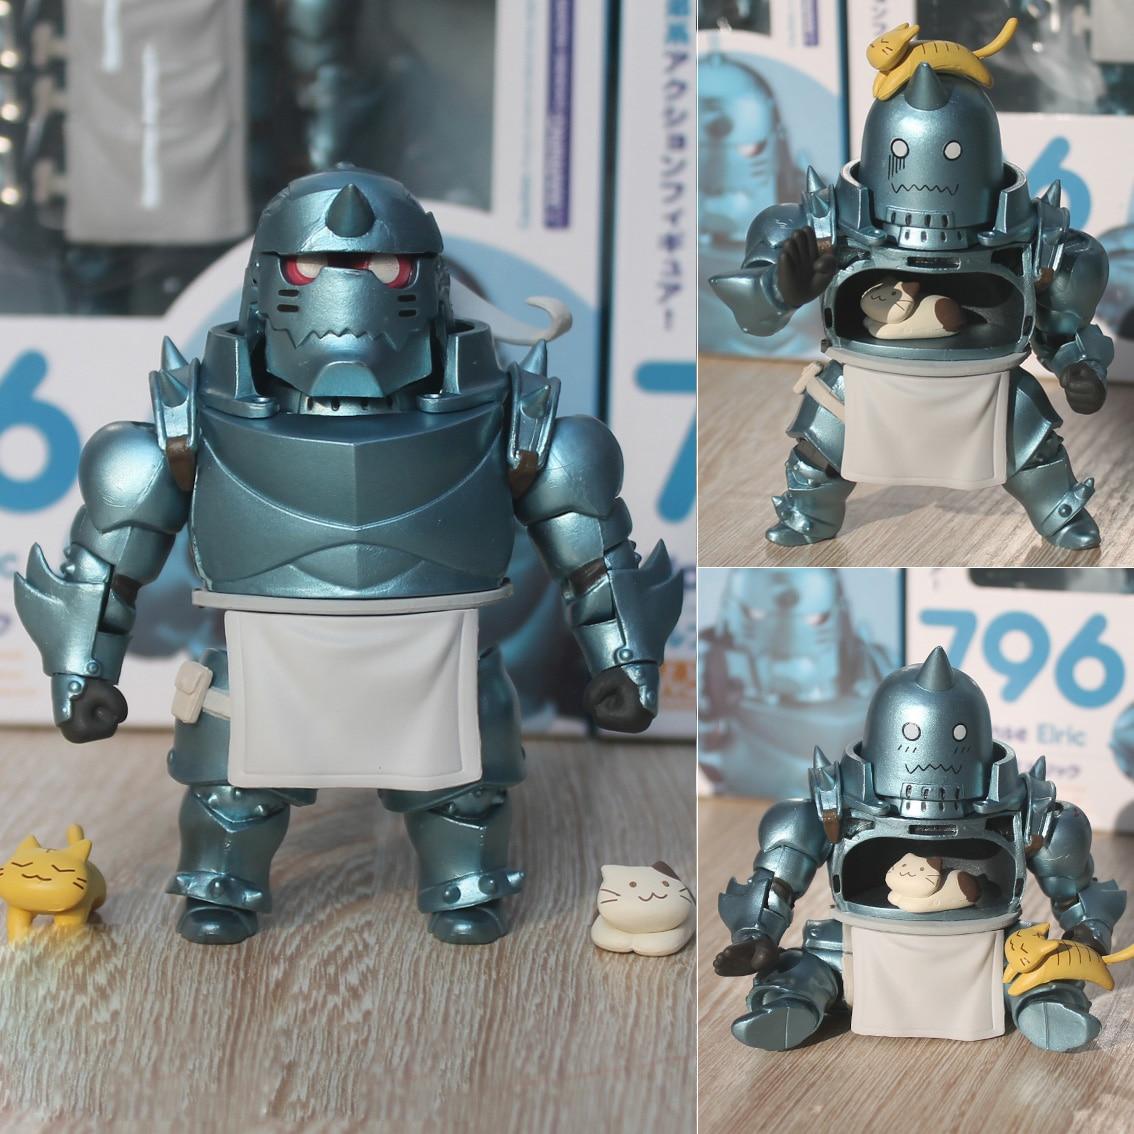 Nendoroid Fullmetal Alchemist Edward Elric 788 Alphonse Elric 796 Cartoon Toy Action Figure Model Doll Gift